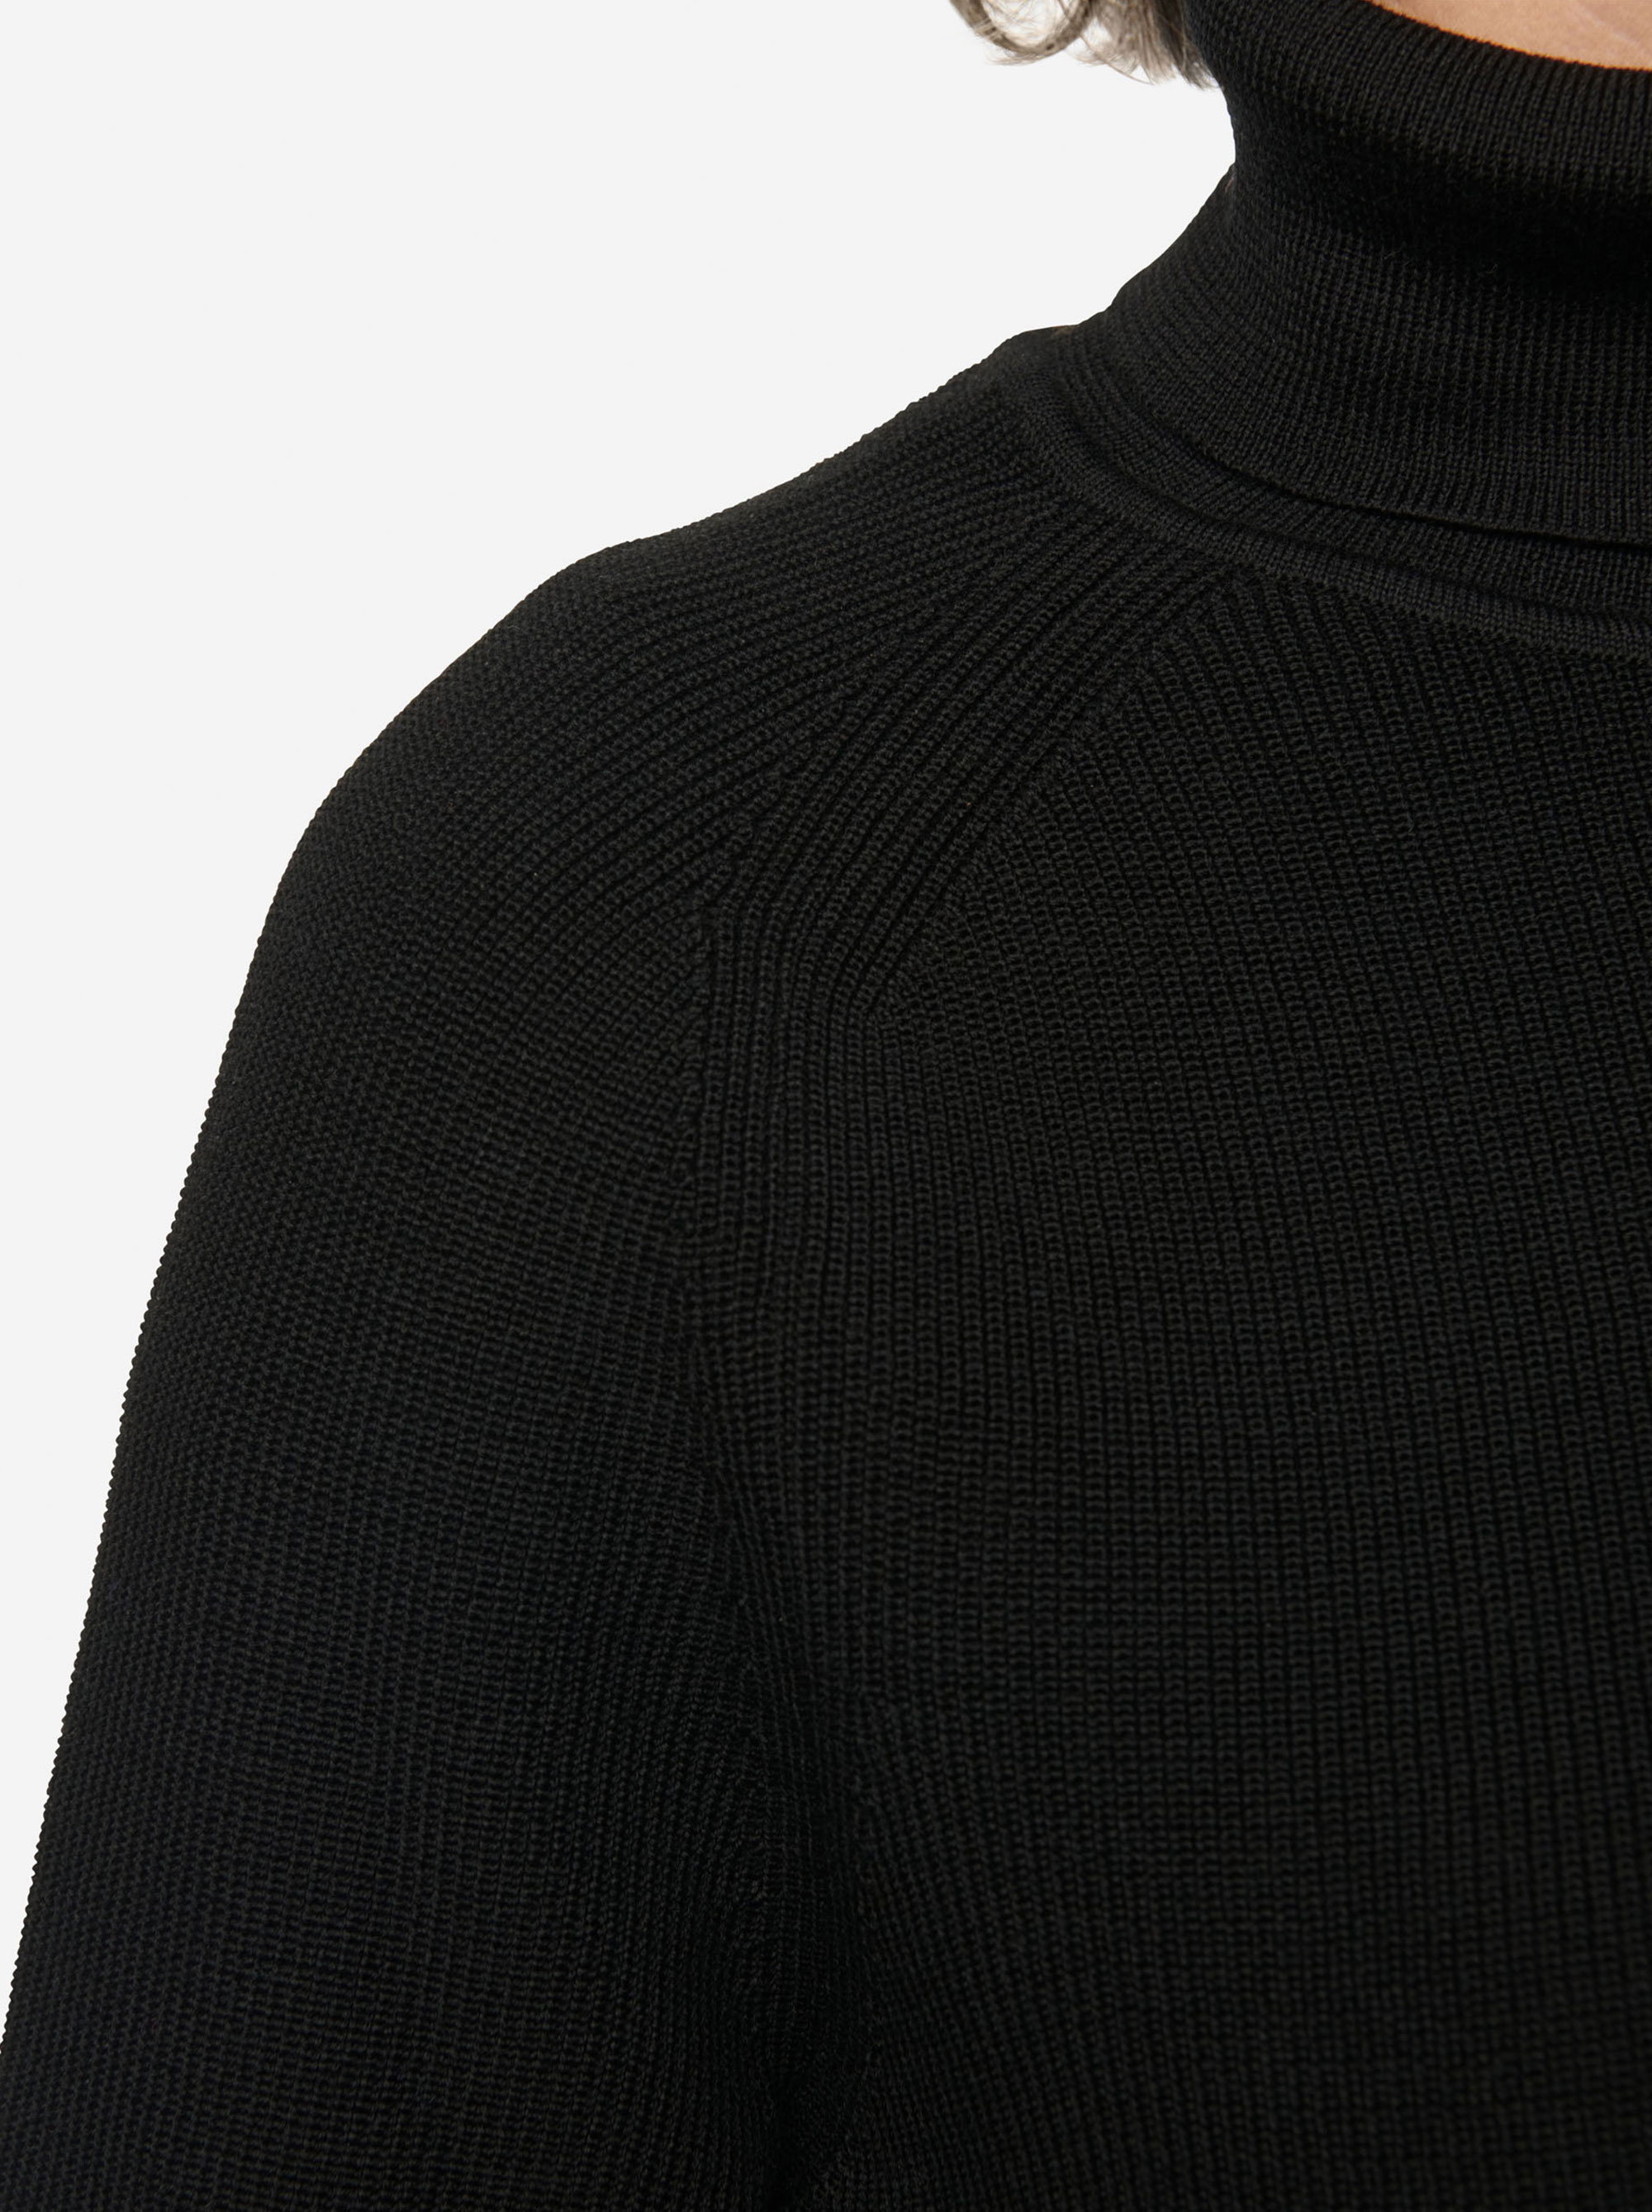 Teym - Turtleneck - The Merino Sweater - Women - Black - 7